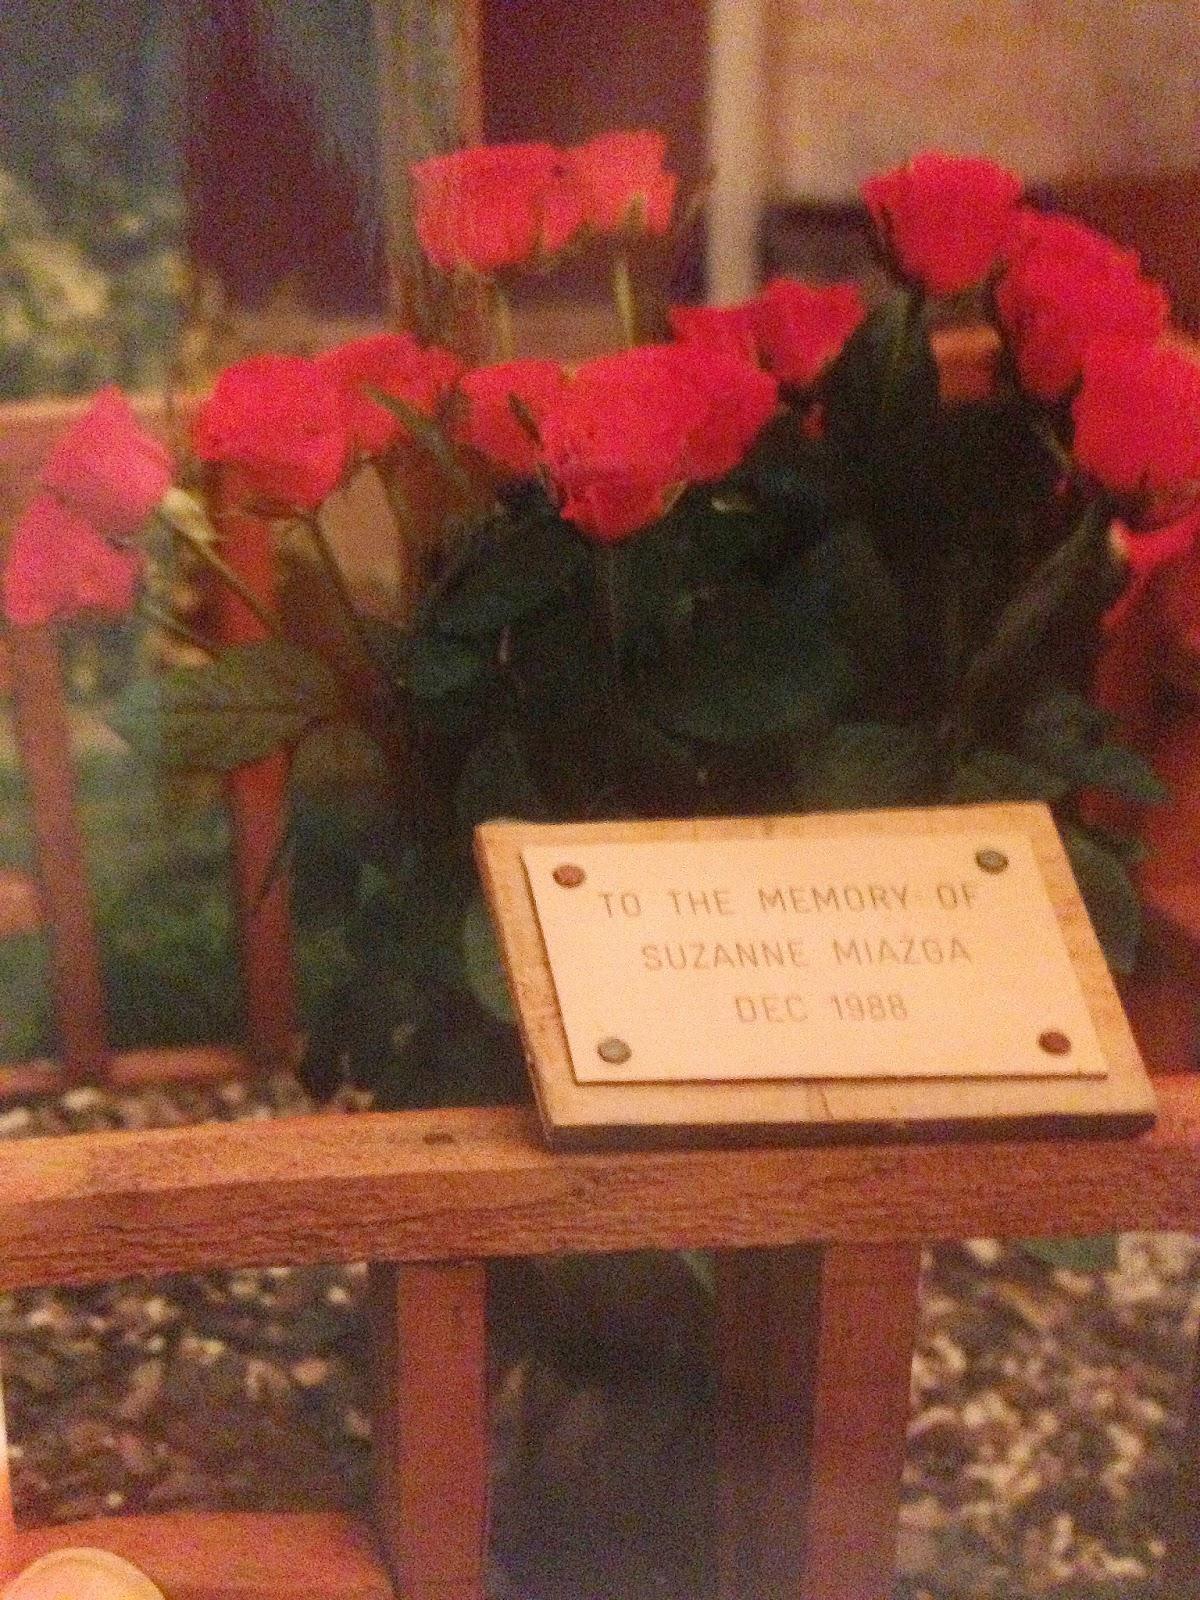 http://4.bp.blogspot.com/-WCQ9-MGFRR0/UbeI6uCC2aI/AAAAAAAAEKc/TSBQDaRPlo8/s1600/roses.jpg